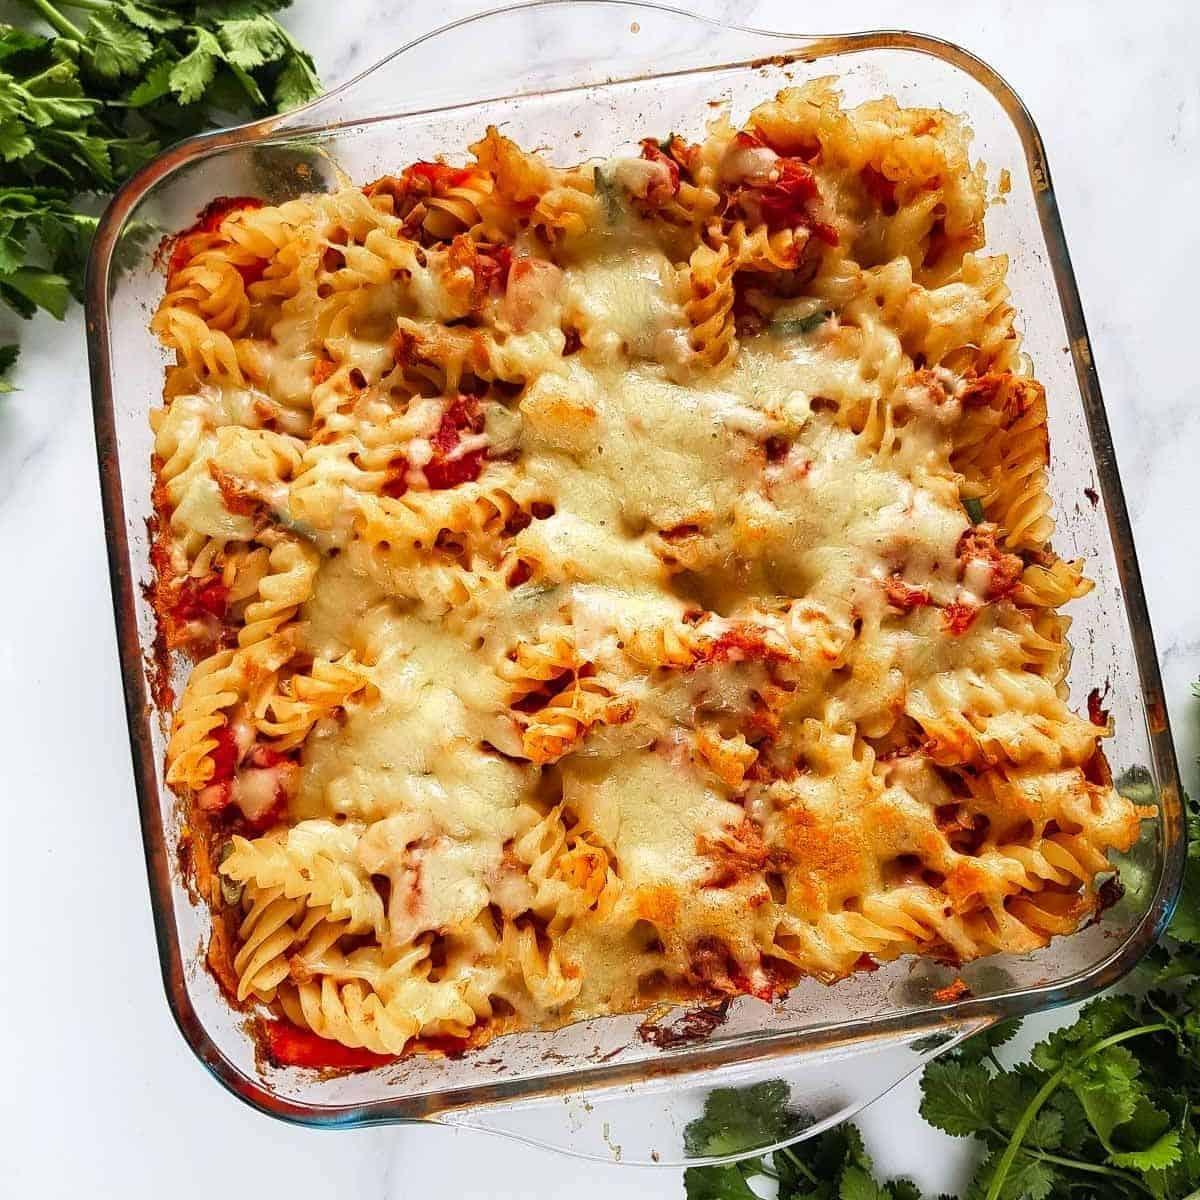 Healthy Tuna Pasta Bake So Easy Hint Of Healthy